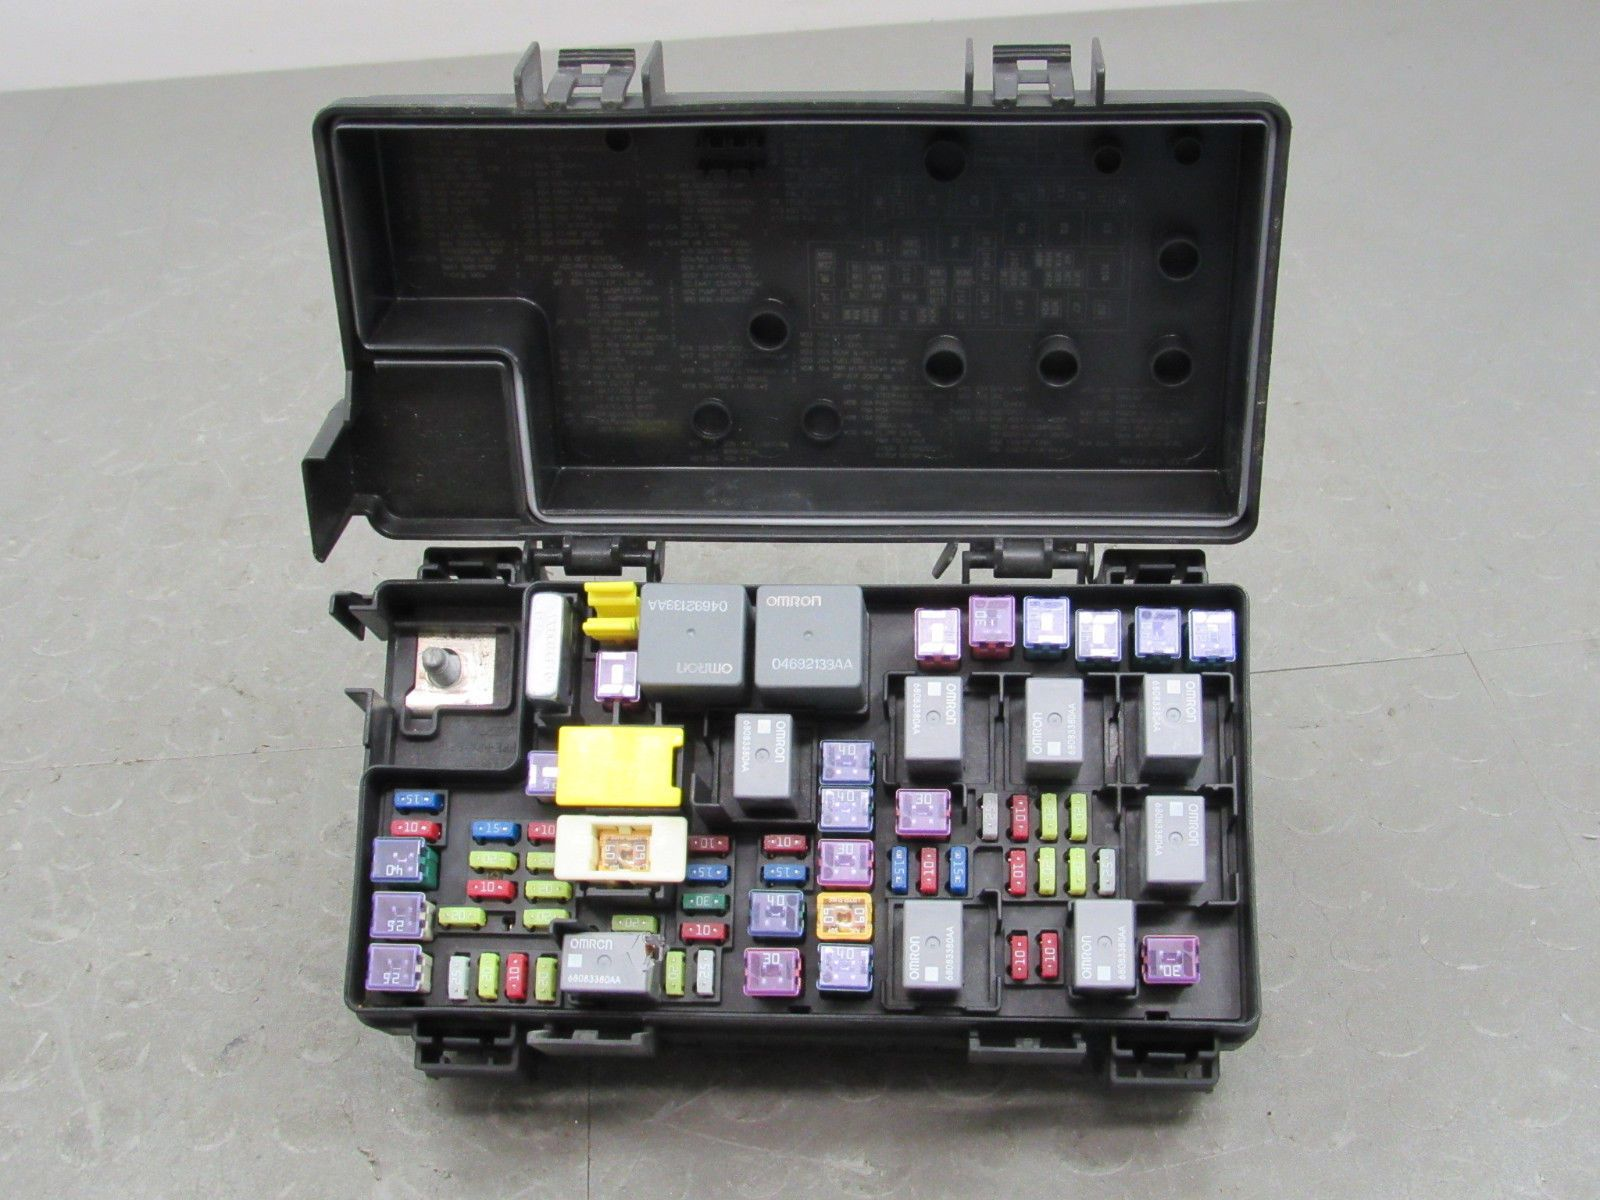 2012 dodge caravan fuse box 12 dodge caravan tipm integrated power module fuse box block  12 dodge caravan tipm integrated power